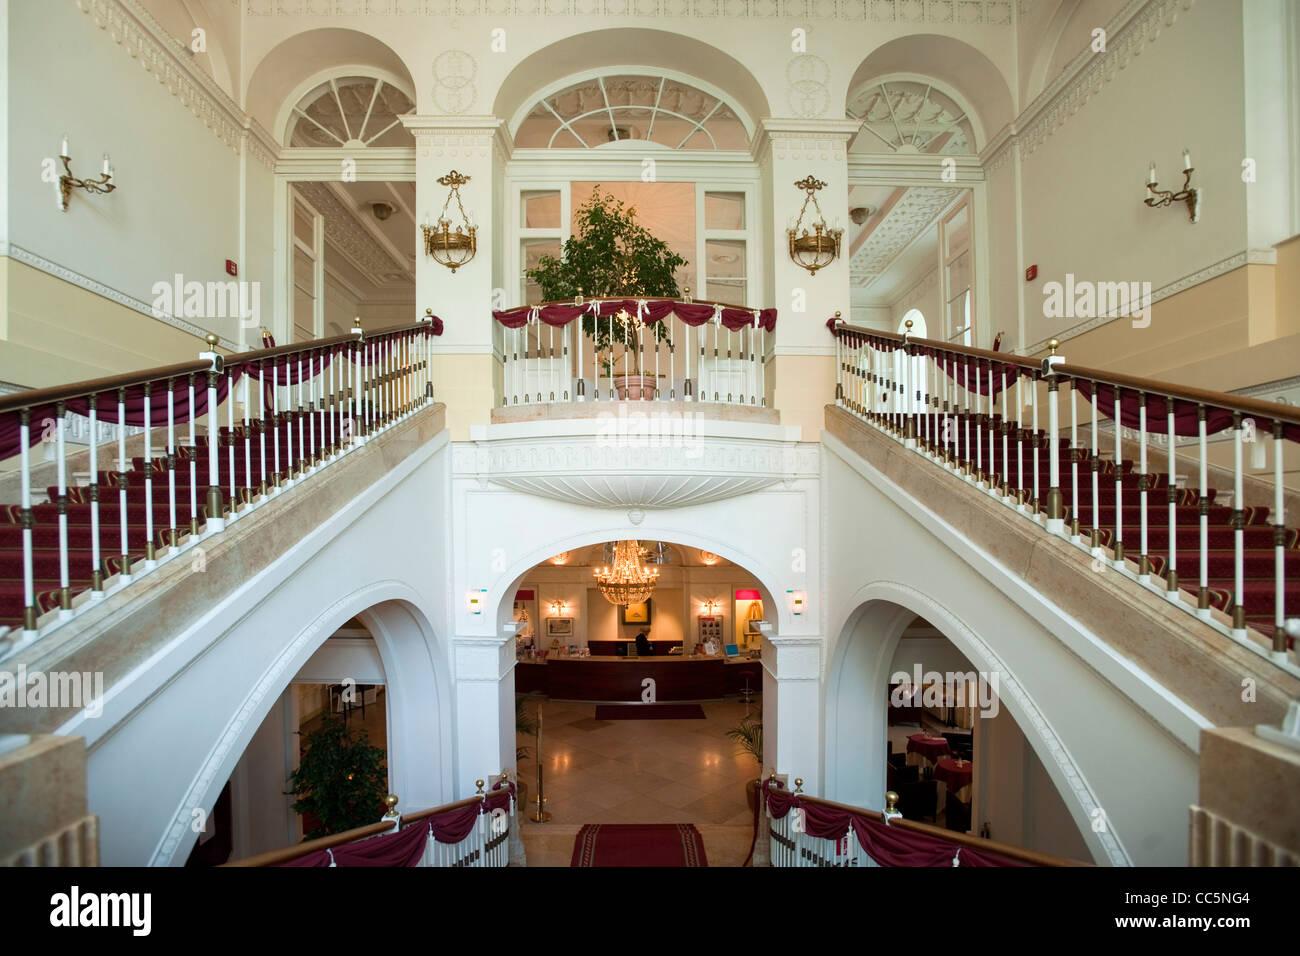 Hotels Nussdorf Wien